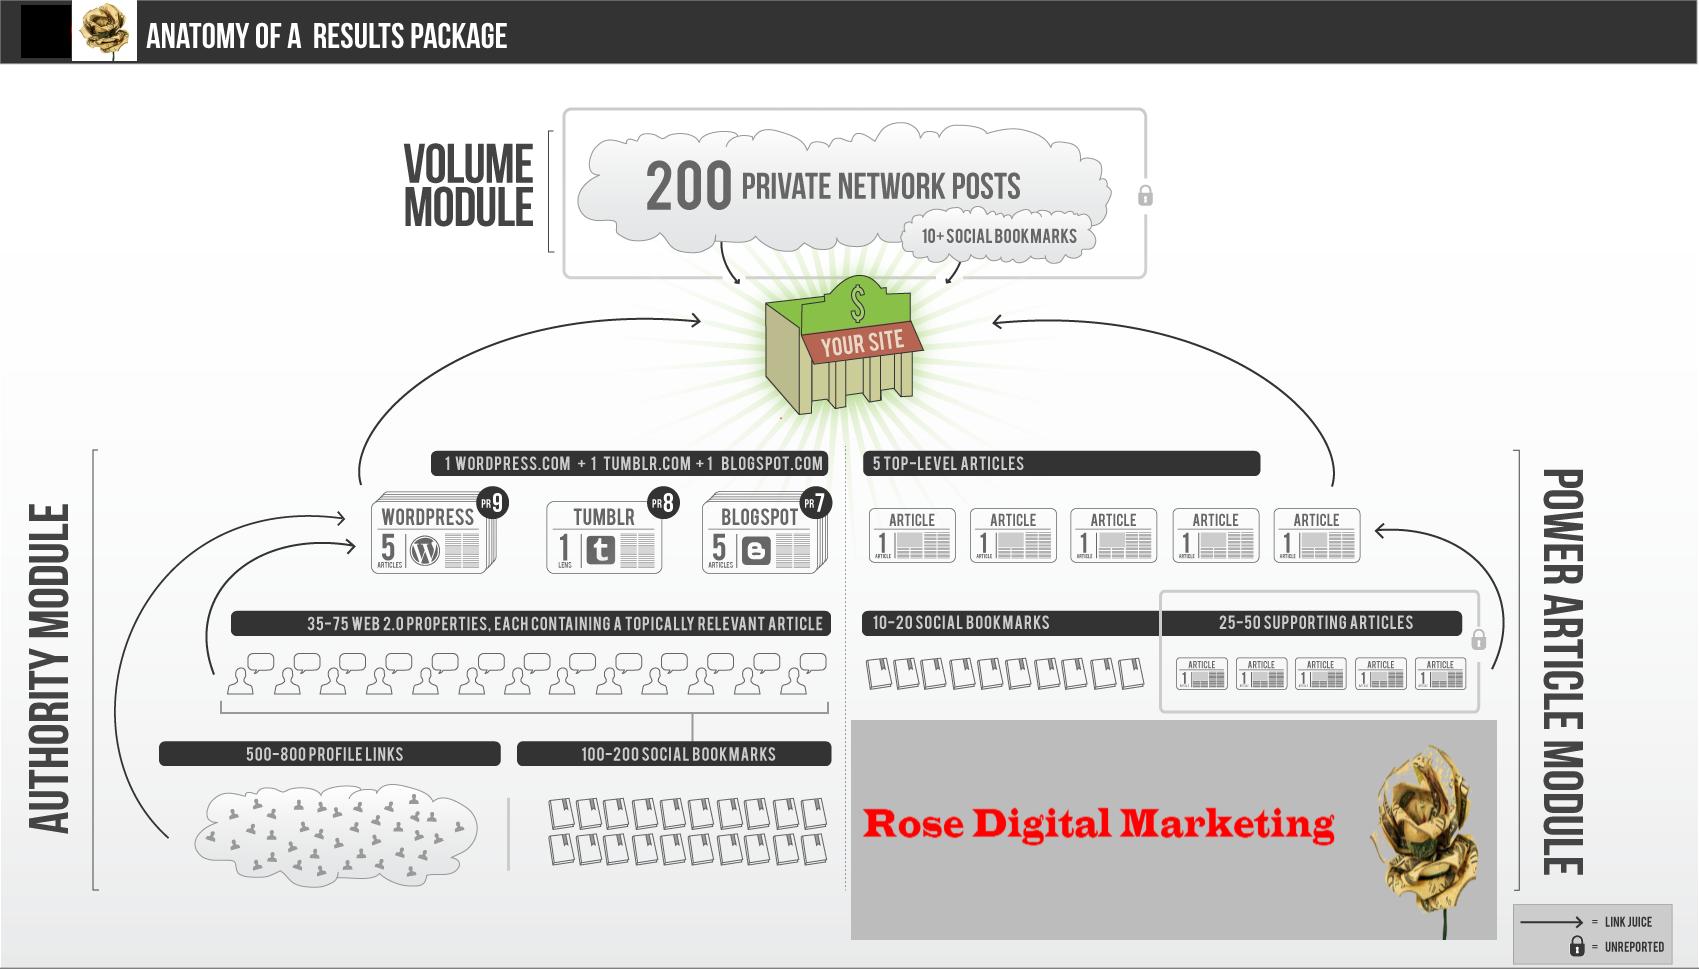 image of RDM SEO infographic